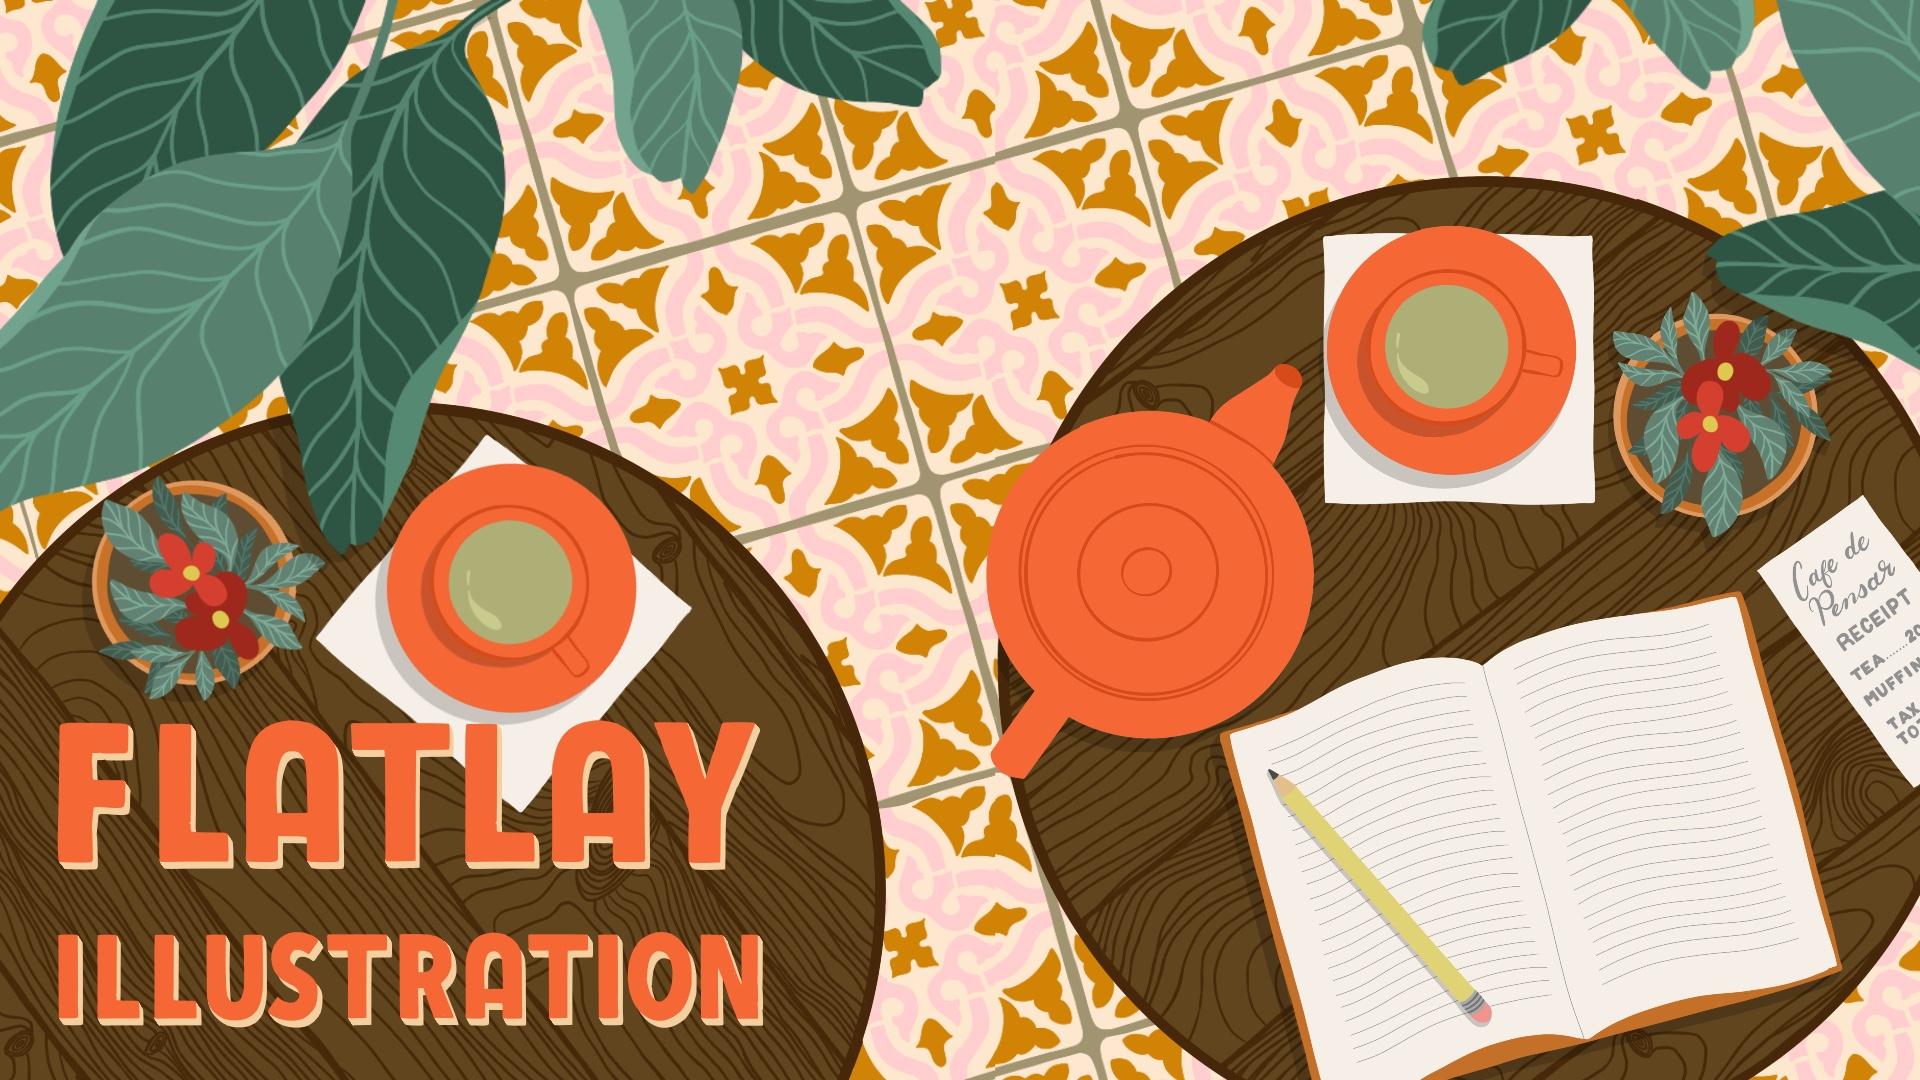 Flatlay Illustrations in Procreate + 6 Free Tile Floor Brushes